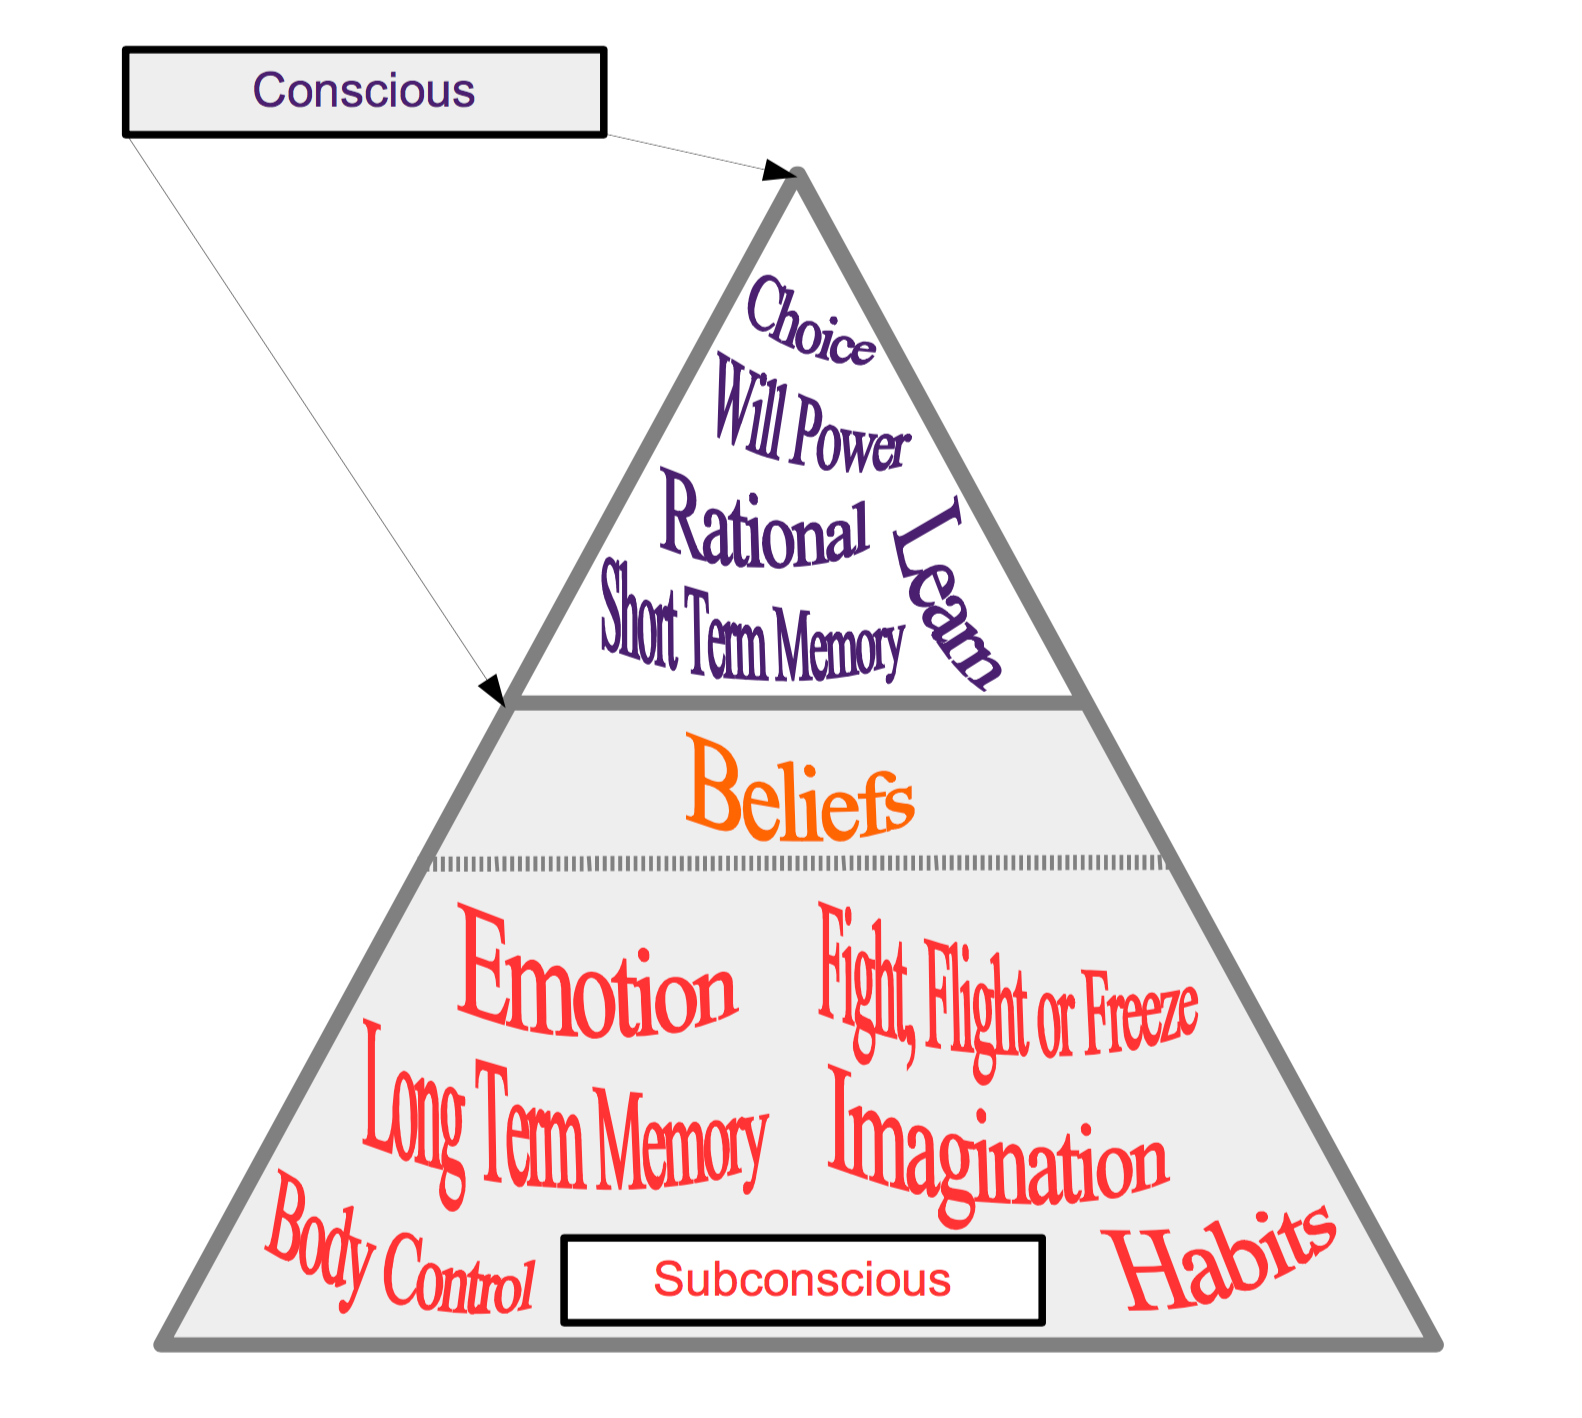 Pyramid Mental Model